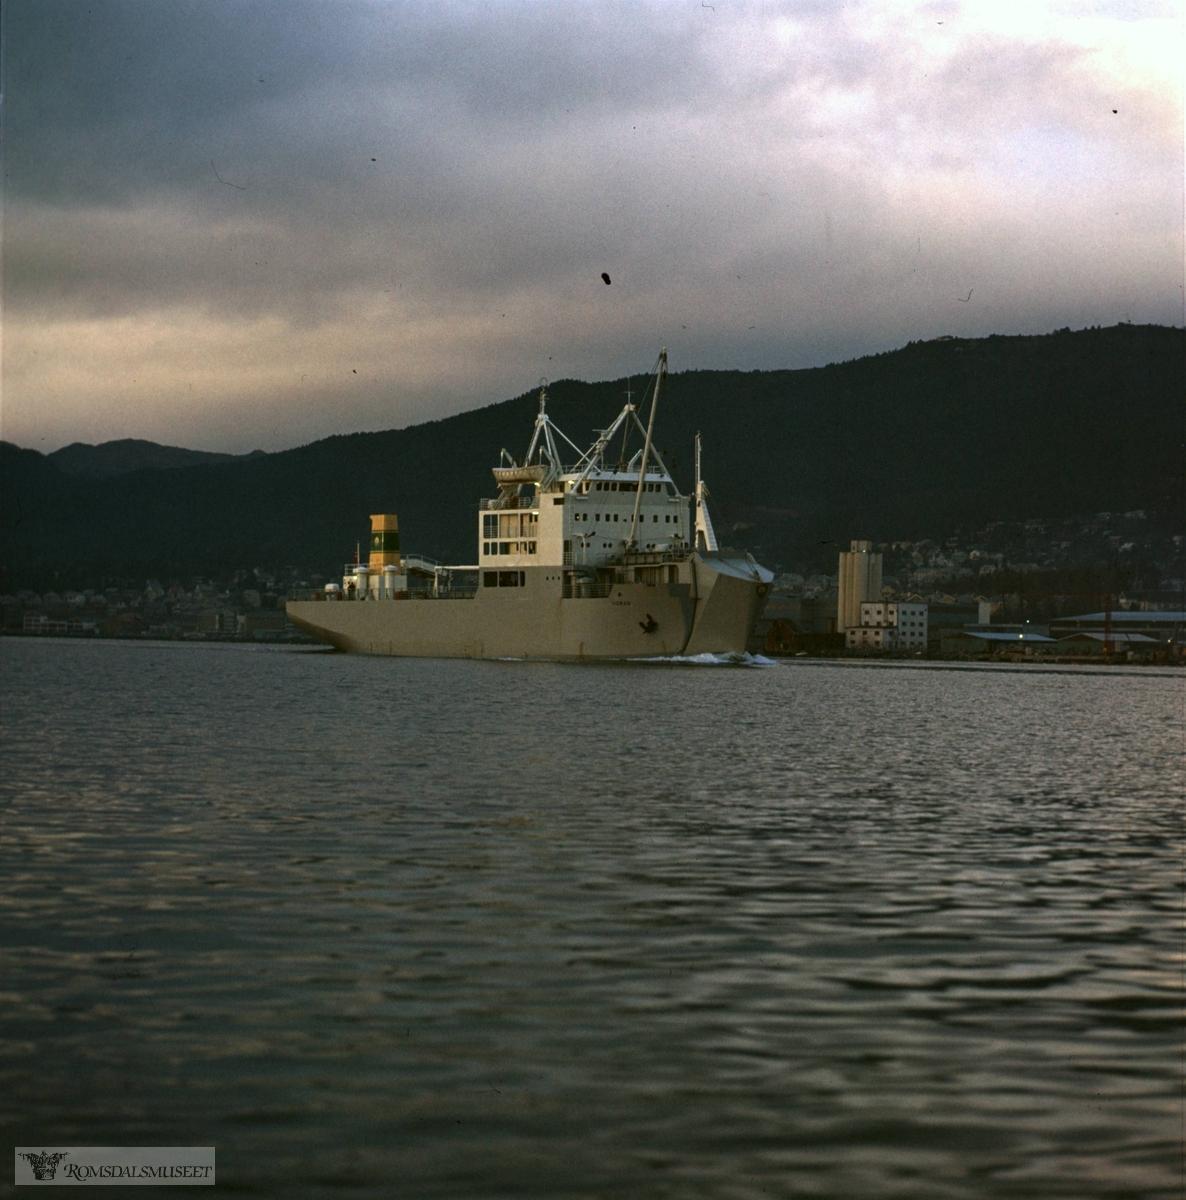 """M/S Norad"" bygd ved Bolsønes verft..Esra Olsen, var kaptein på denne båten i Dar es Salaam da den gikk i rute mellom Dar es salaam, Lindi, Mtwara og Zanzibar i fra 1977 til 1980."